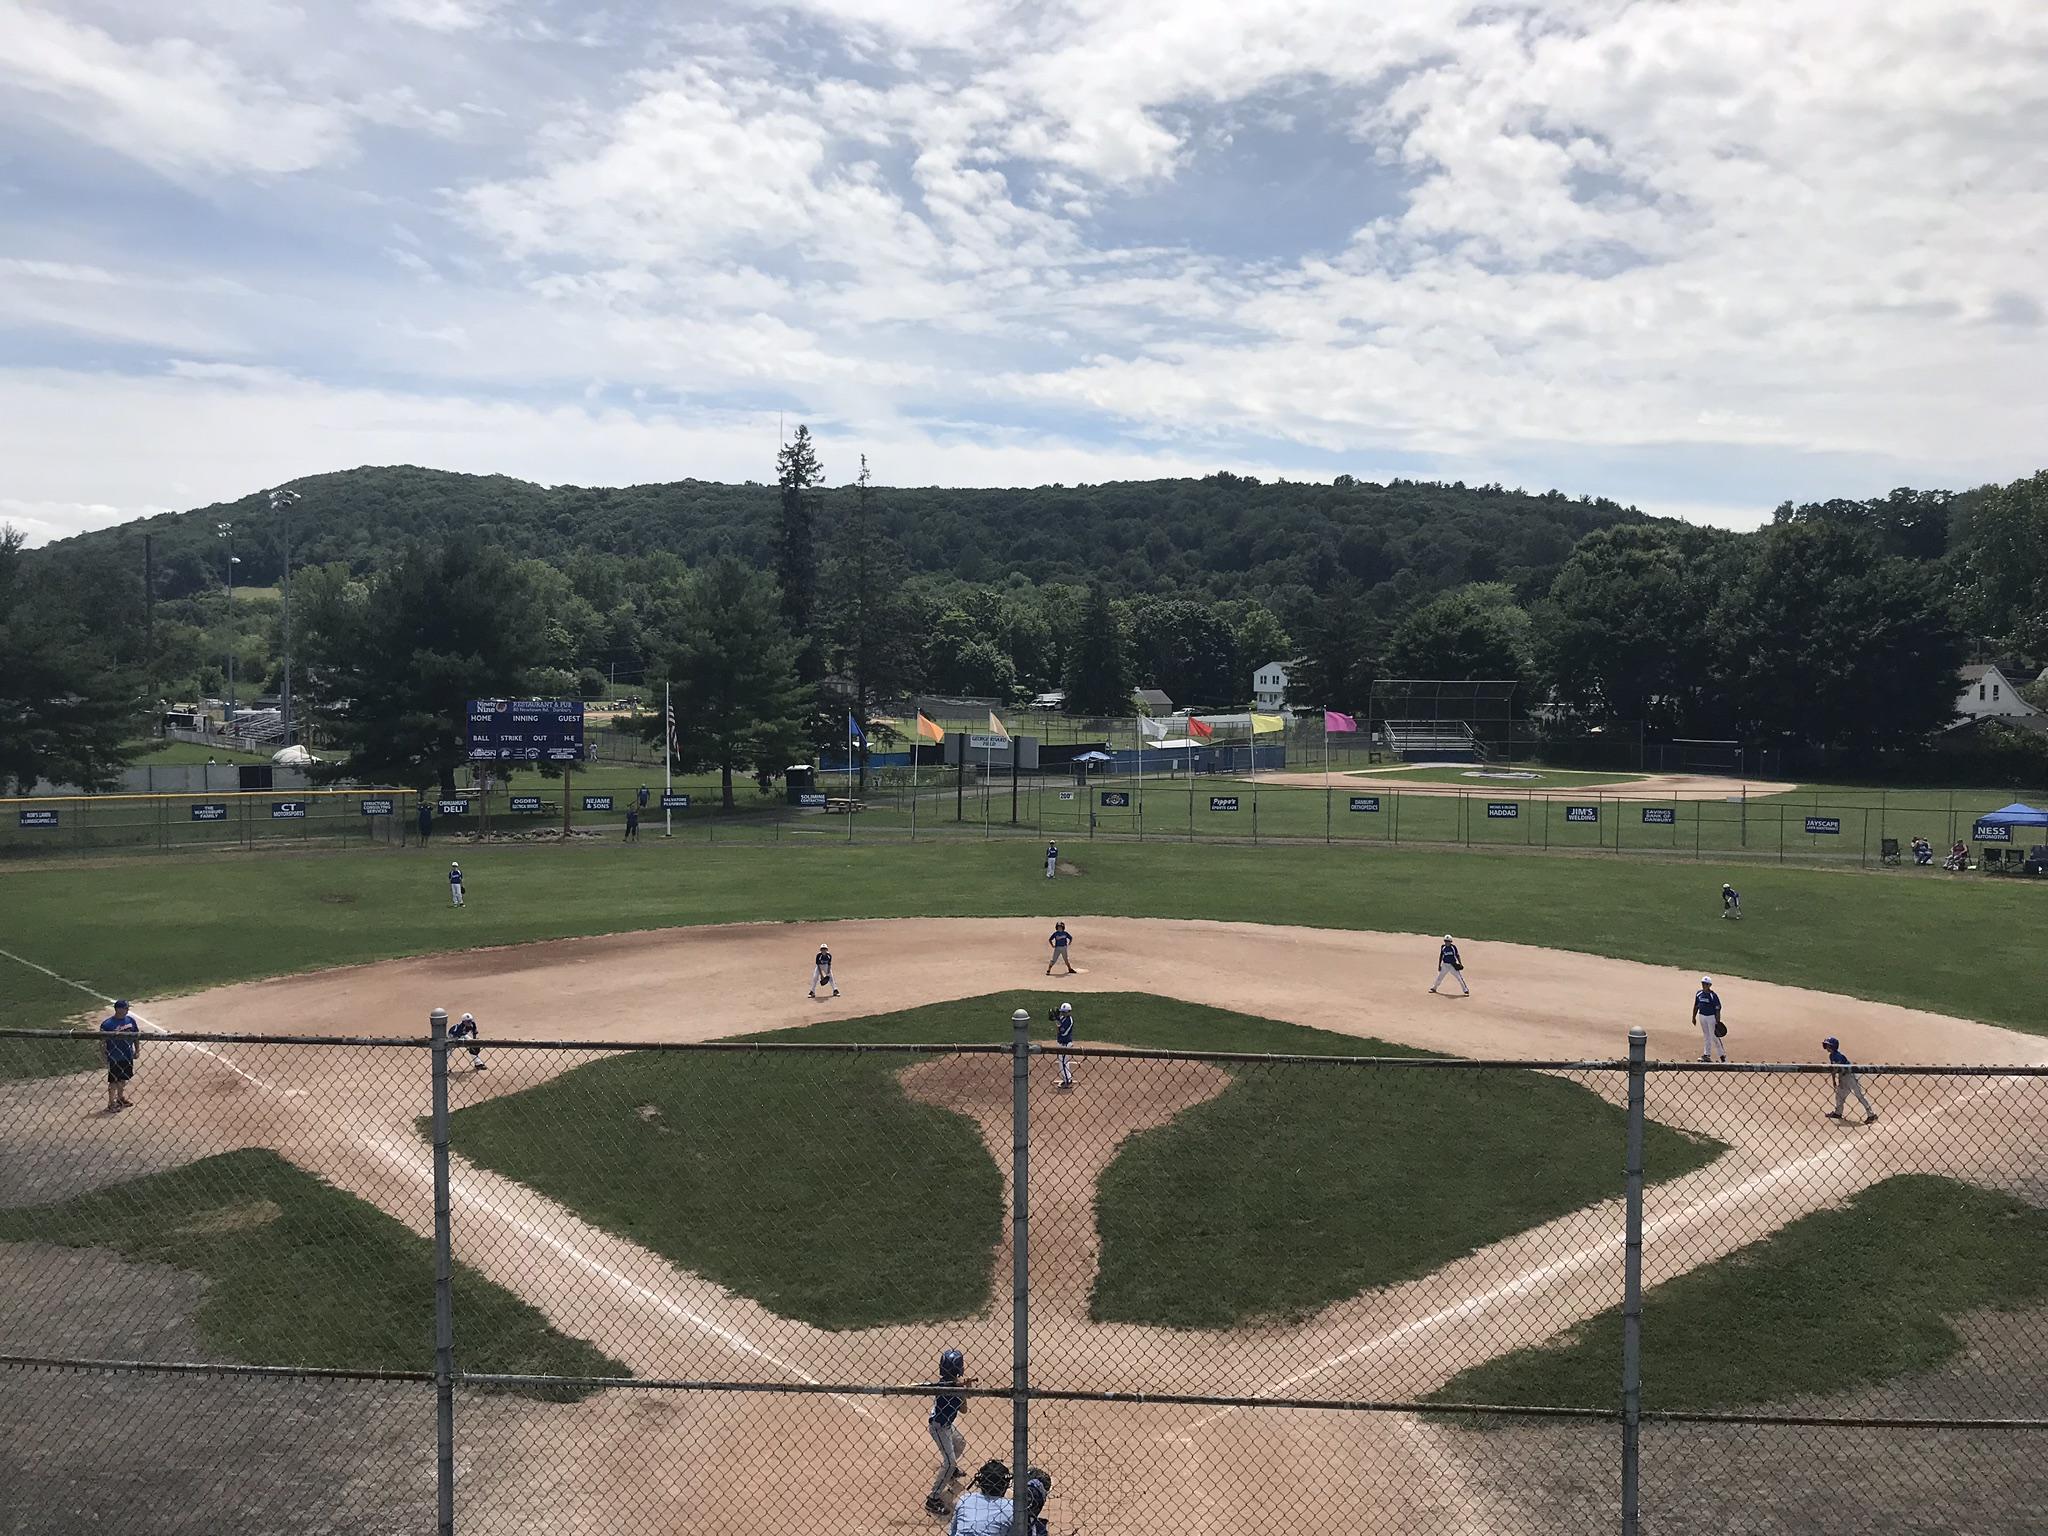 Field 1, Summer 2018 - Danbury 9U vs Norwalk 9U